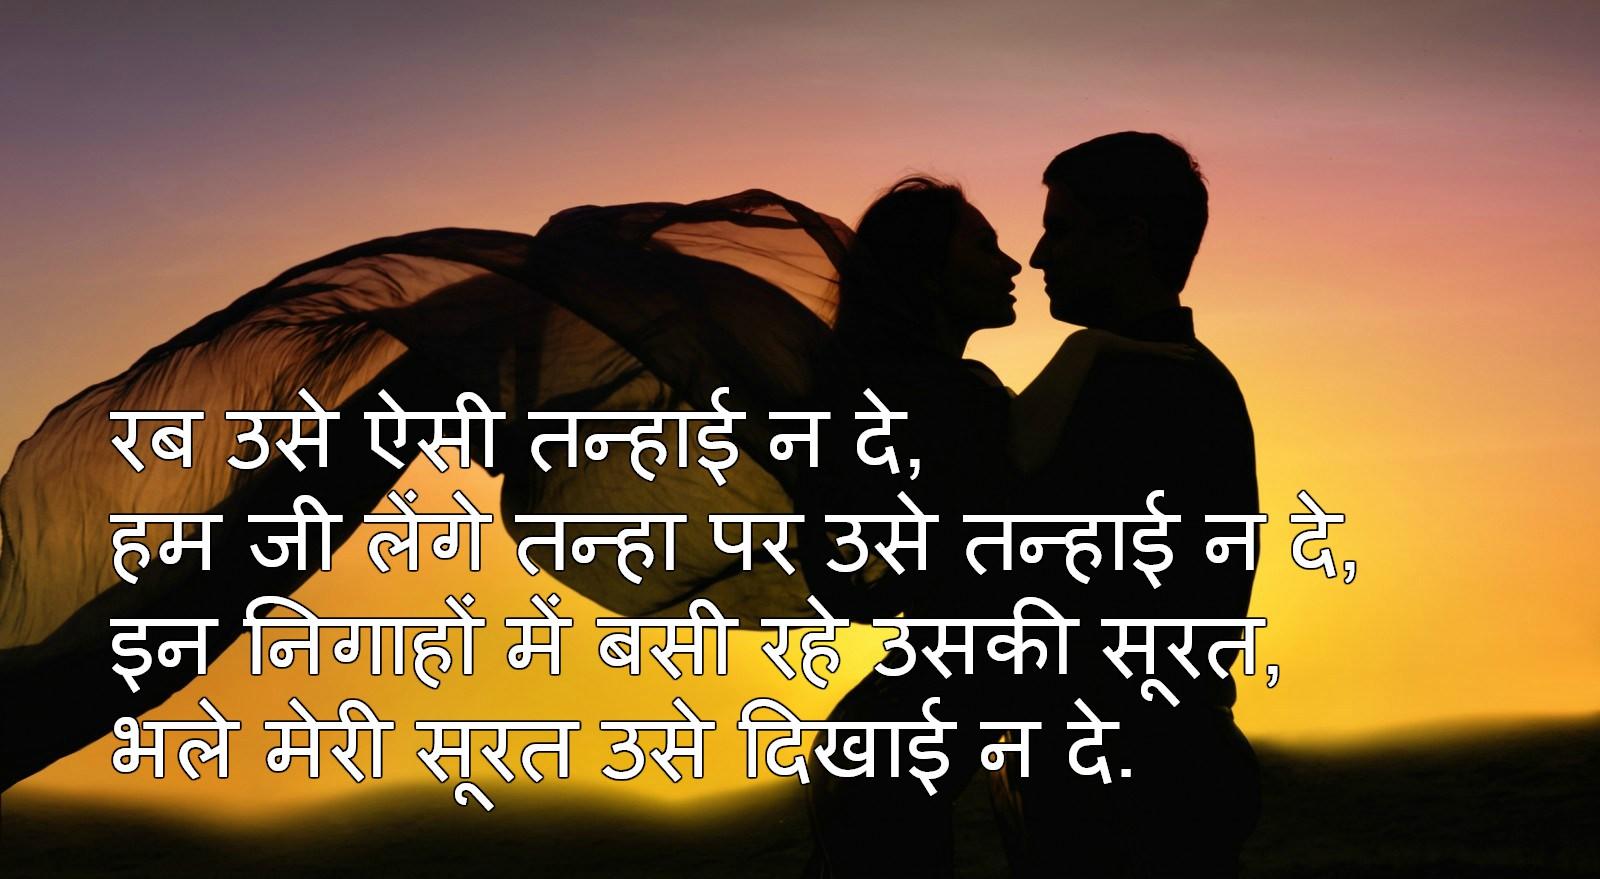 Popular Wallpaper Love Hindi - love%2Bhindi%2Bki%2Bshayari%2Bimages%2Bwallpaper  Picture_428070.jpg